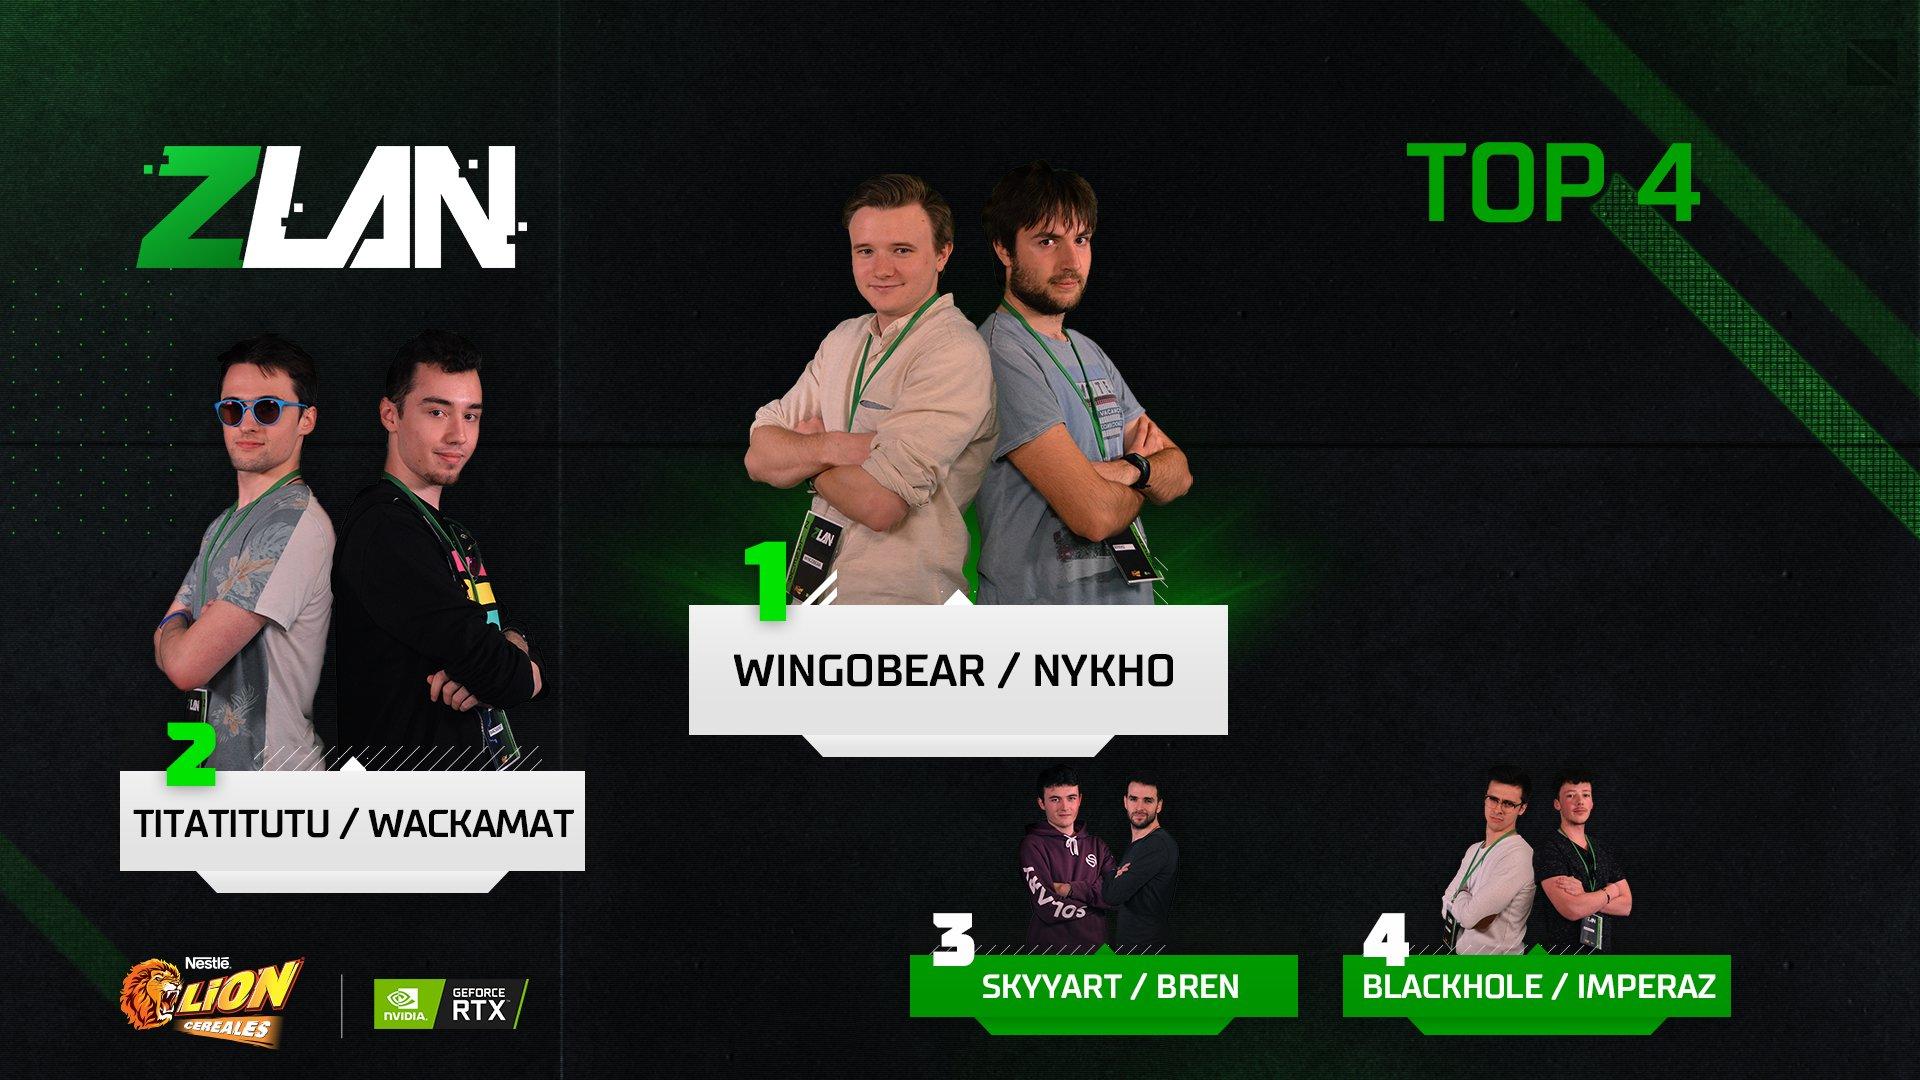 Le podium de la Z LAN 2019